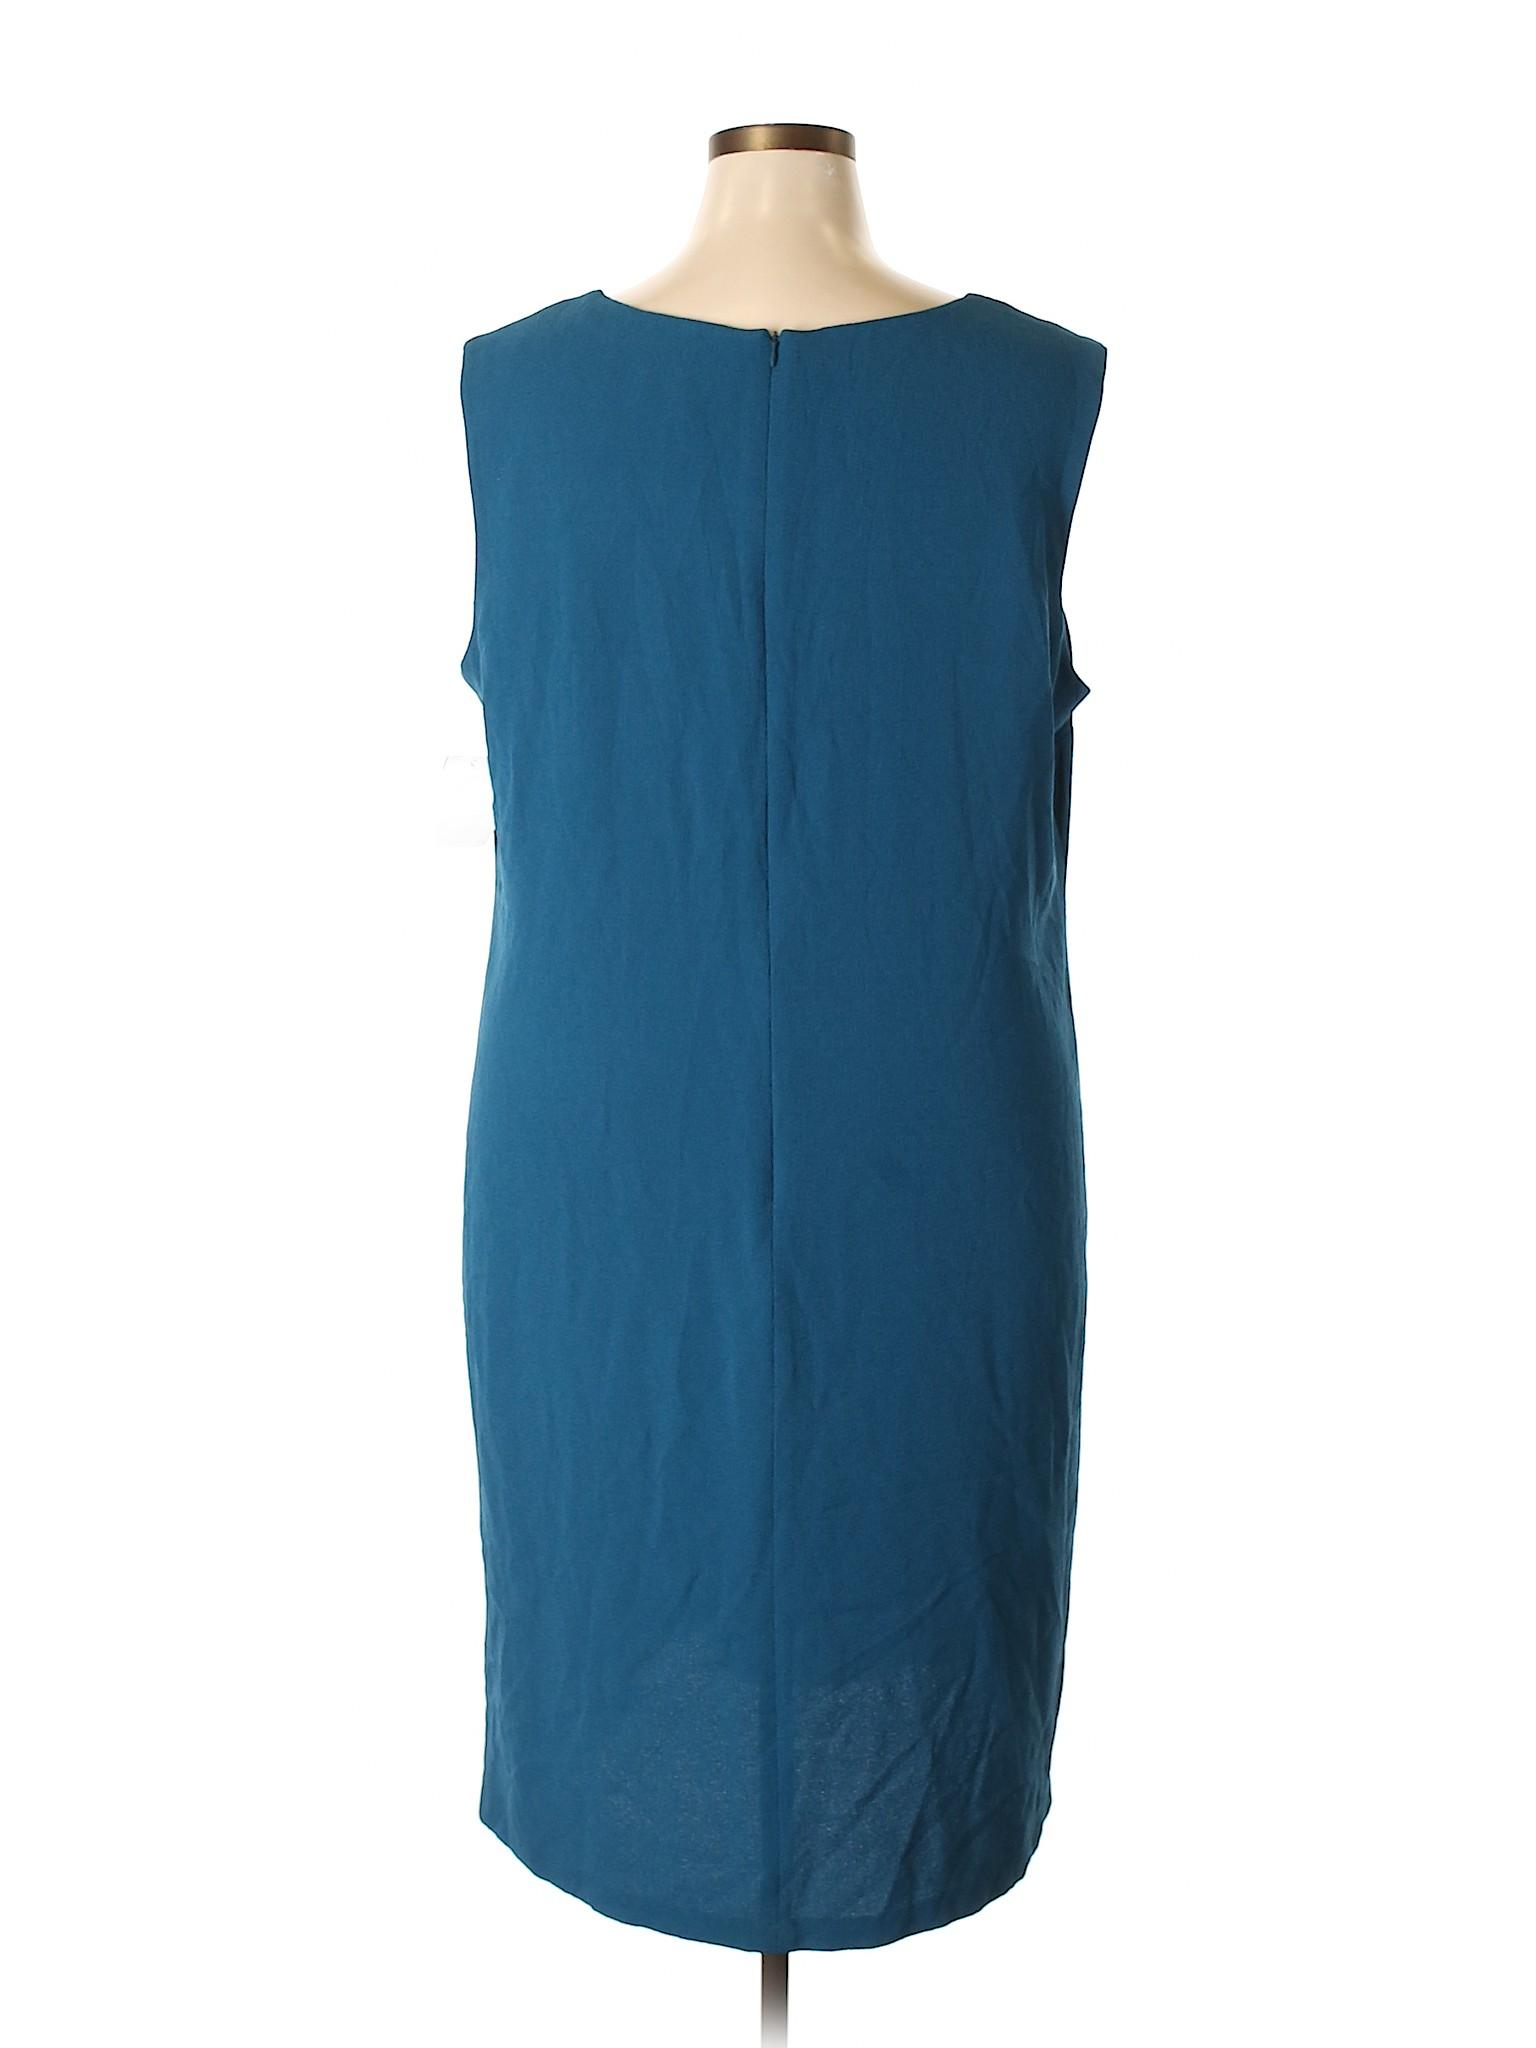 R Boutique Casual amp;M Dress Richards winter vSn6BqU